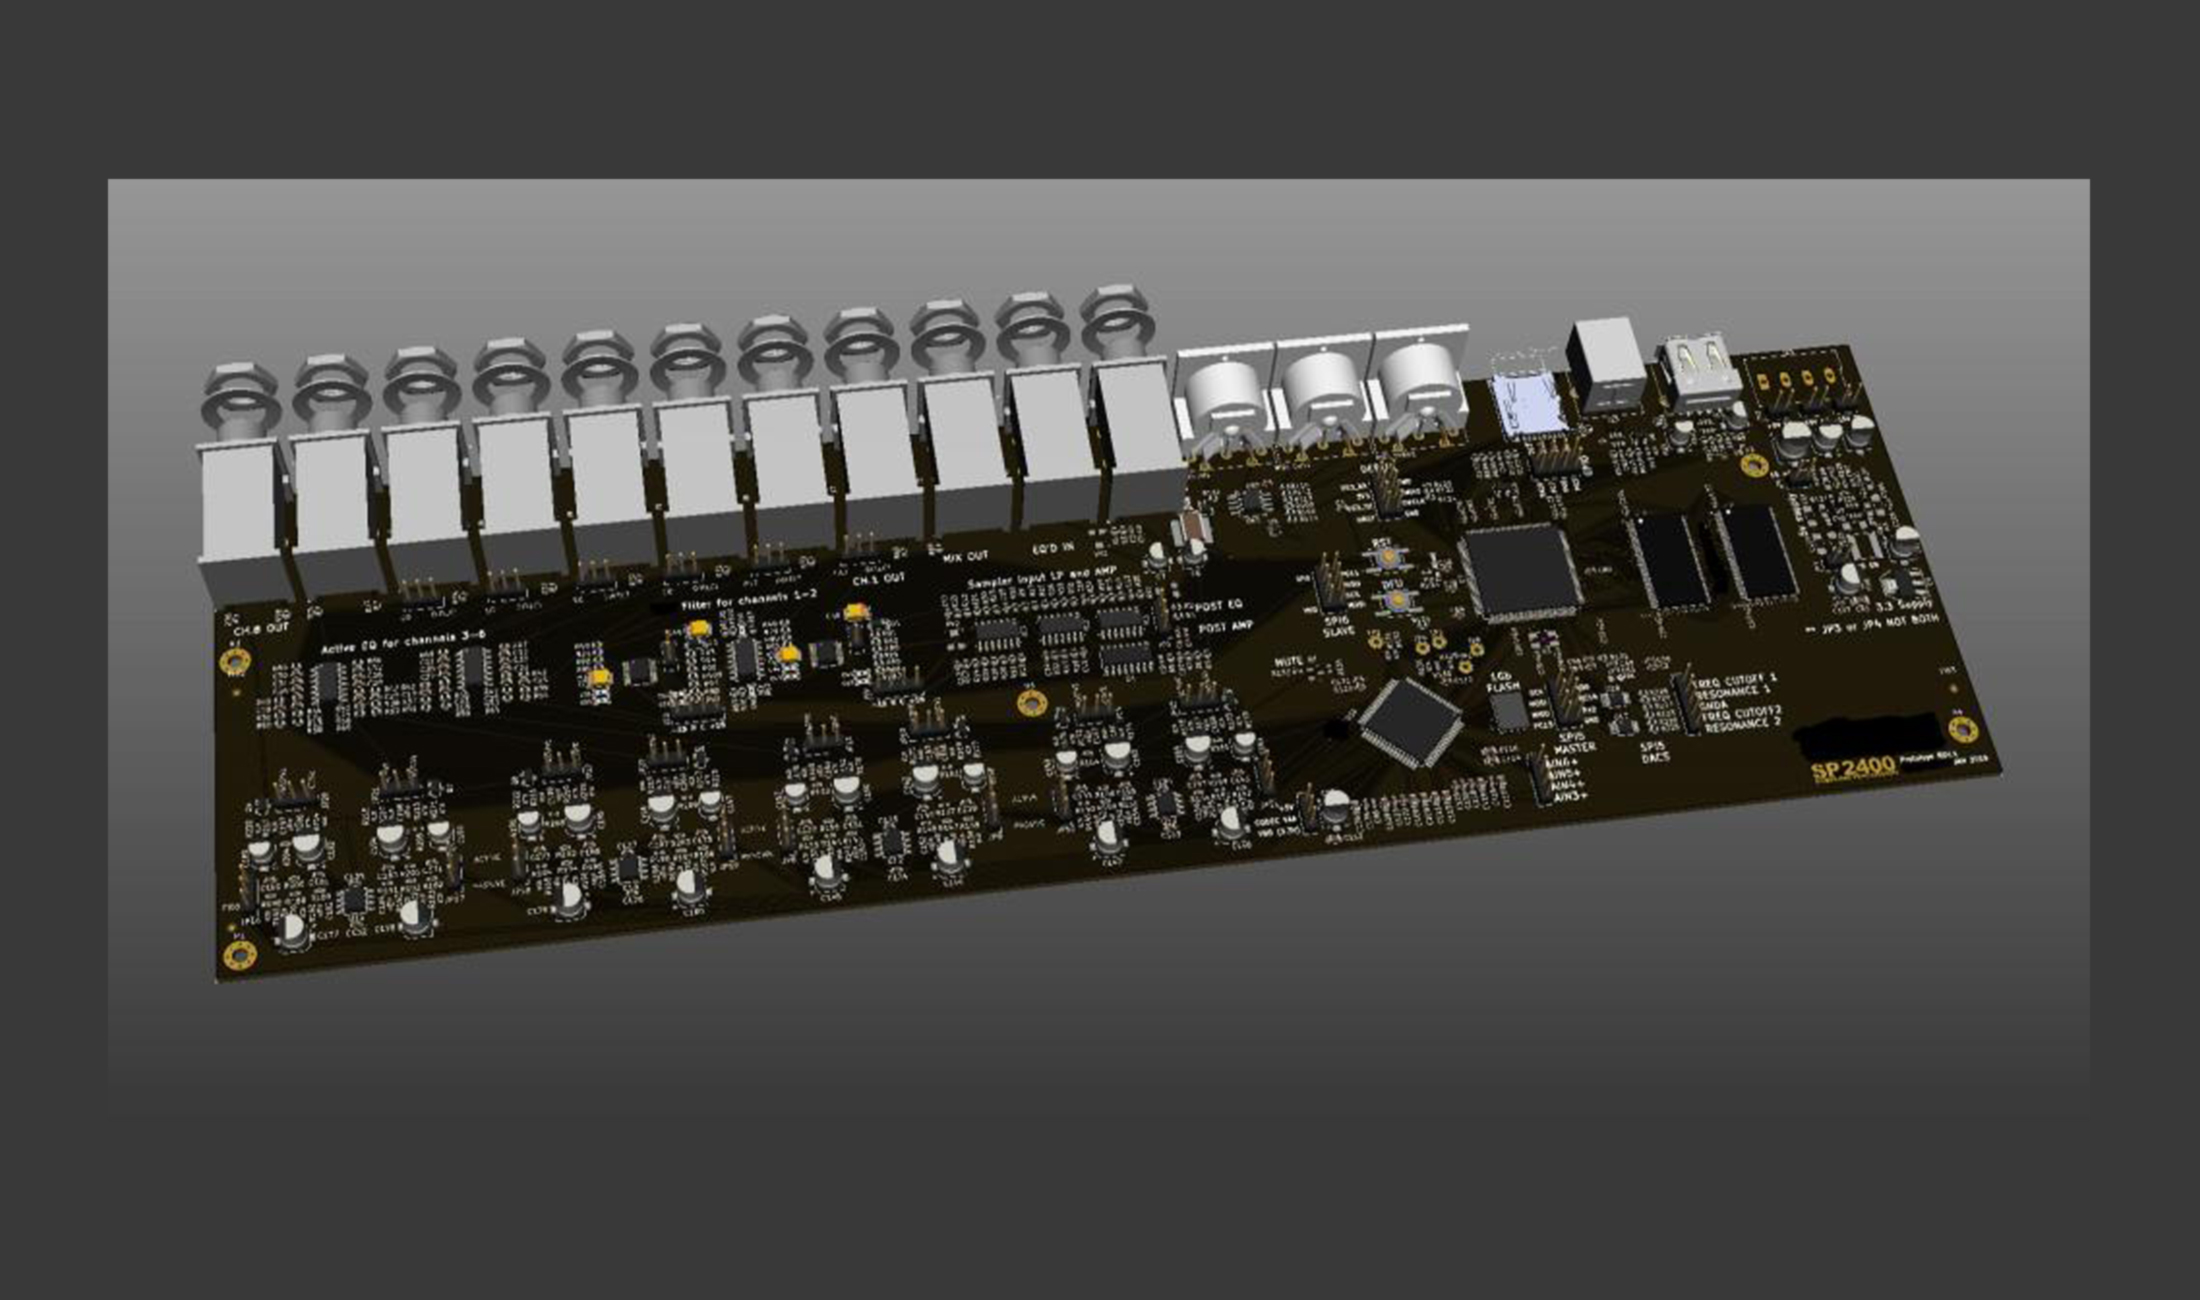 SP-2400: Baut Behringer einen Klon des Kult-Samplers E-Mu SP-1200?